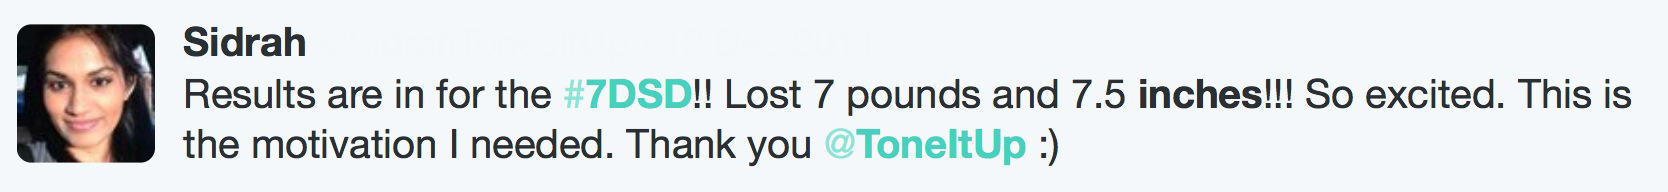 tone-it-up-7-day-slim-down-26